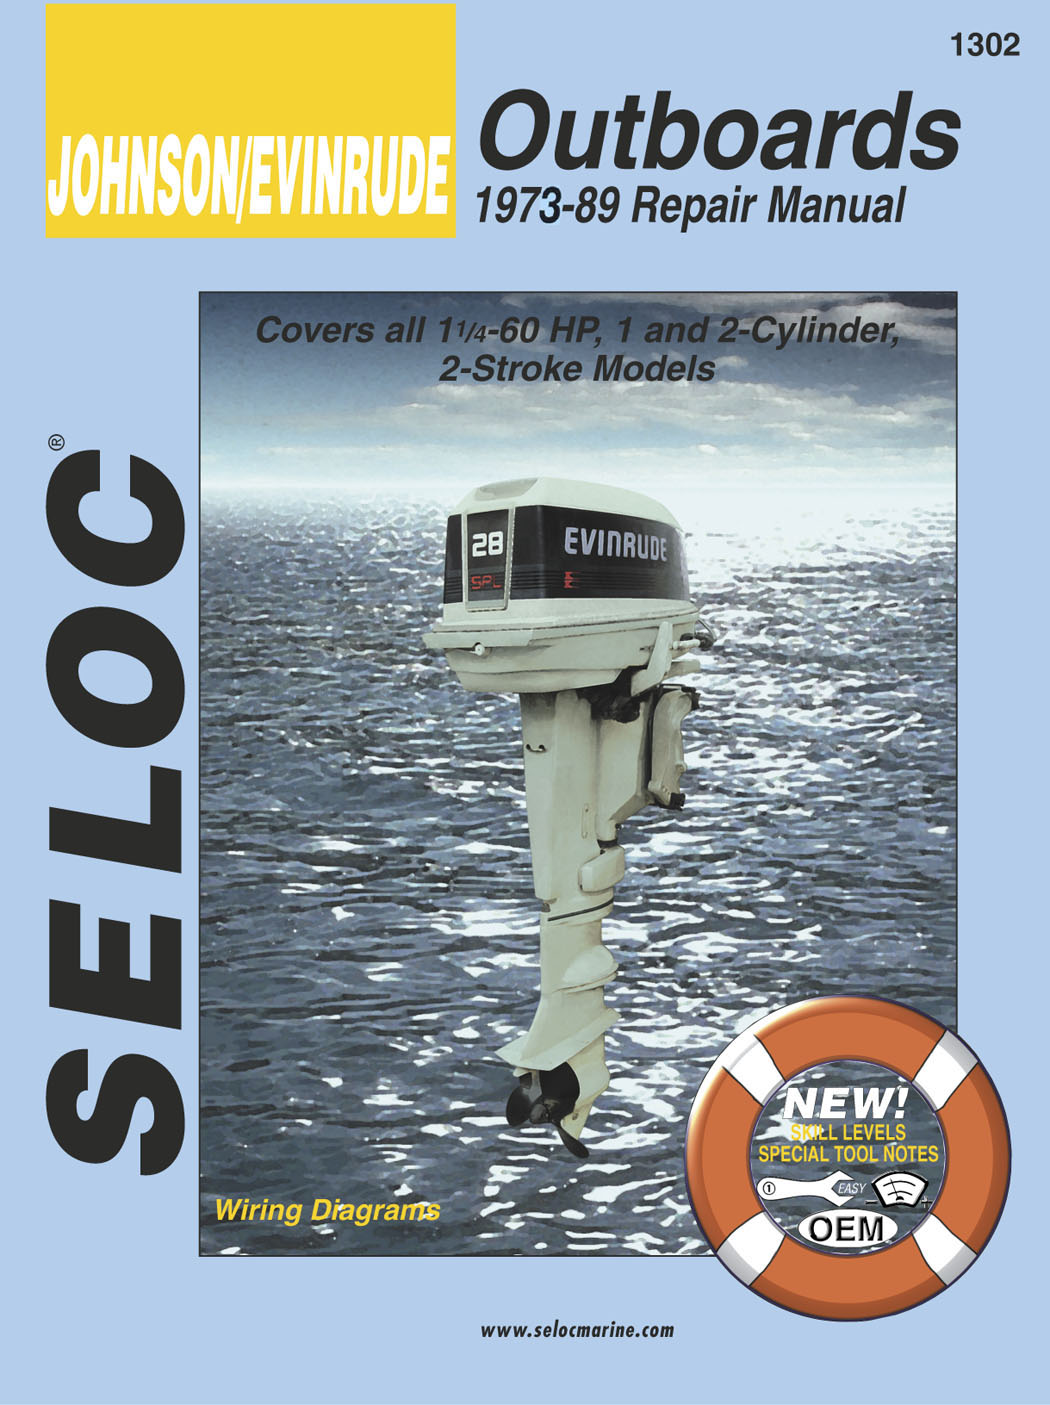 Amazing Repair Manuals Laurentian Marine For All Your Boating Needs Monang Recoveryedb Wiring Schematic Monangrecoveryedborg